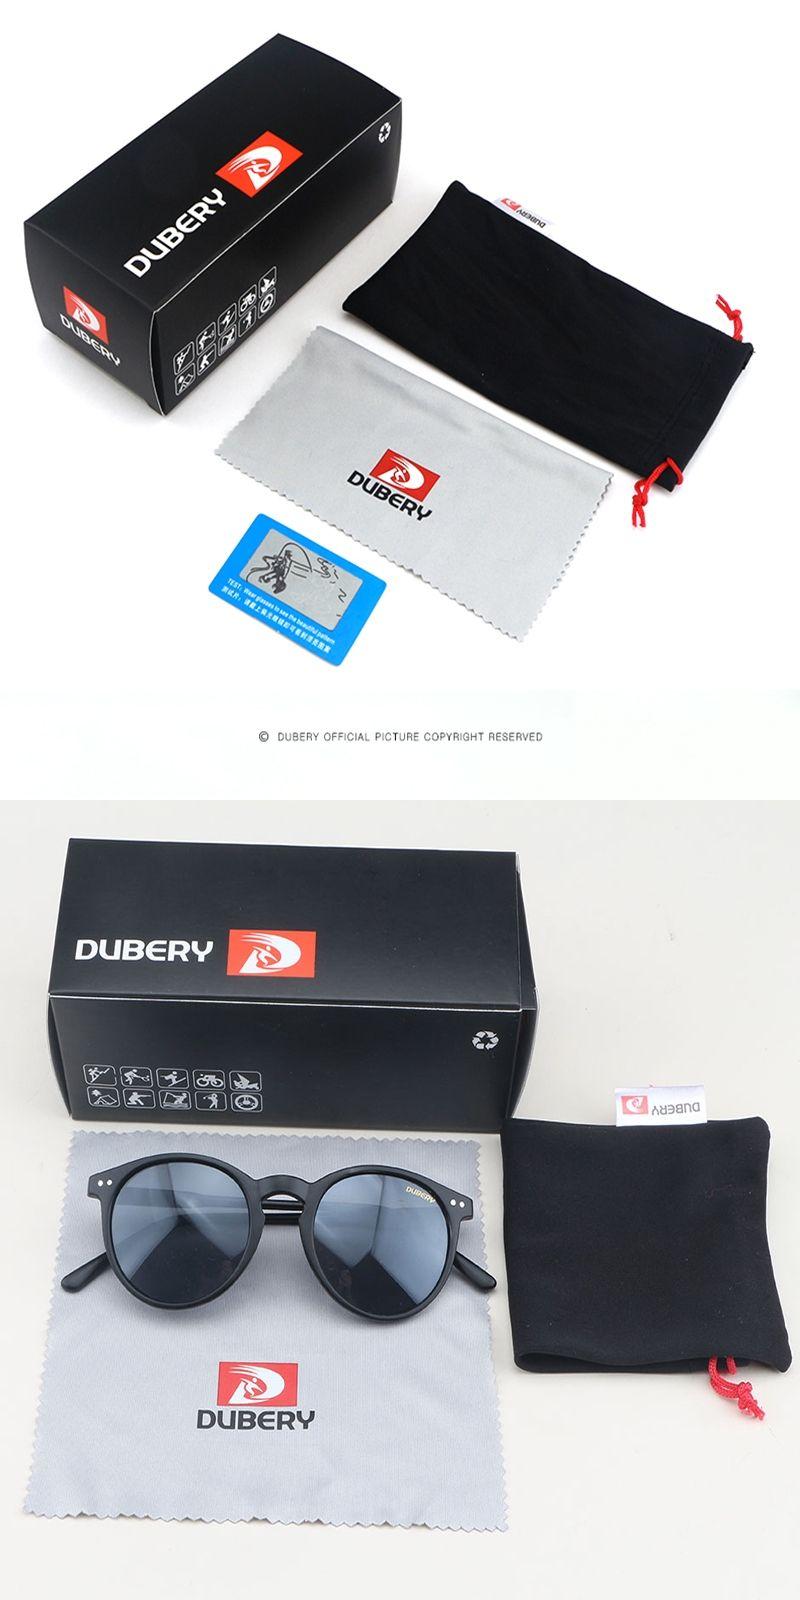 914f7c8e06 DUBERY Men s Aluminum Mens Sunglasses Mirror Sun Glasses Square For Men  Female gafas